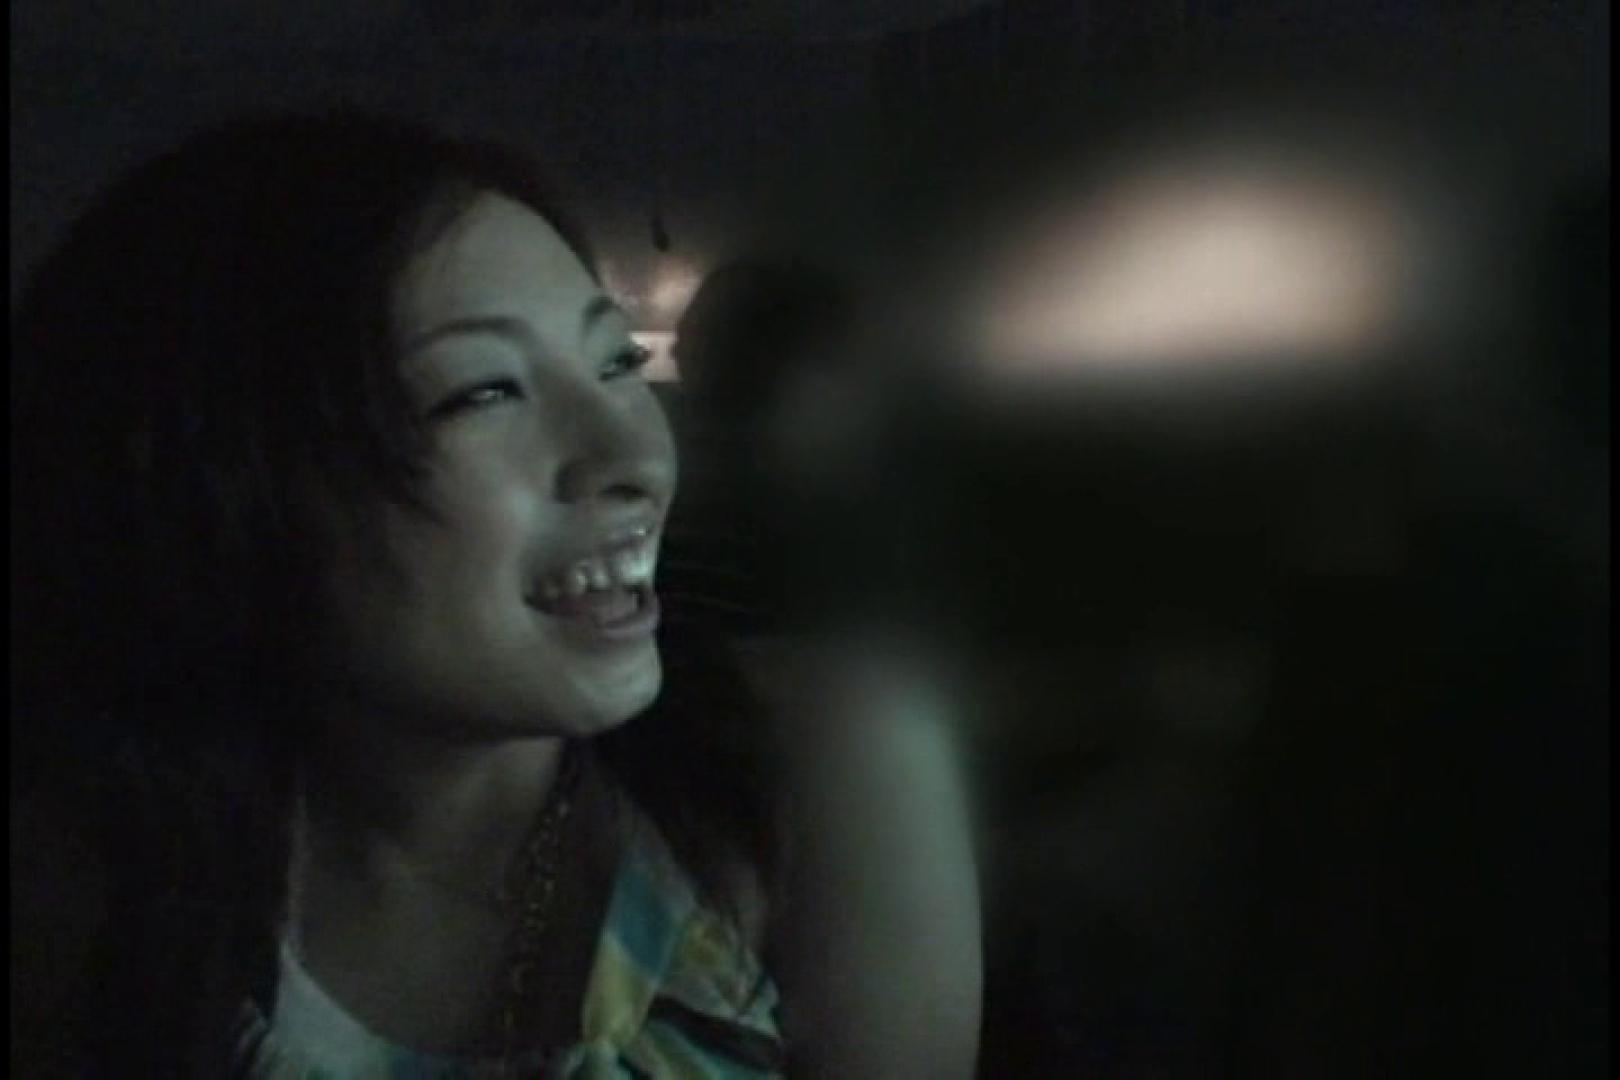 JDハンター全国ツアー vol.025 前編 女子大生のエロ動画  93PIX 40